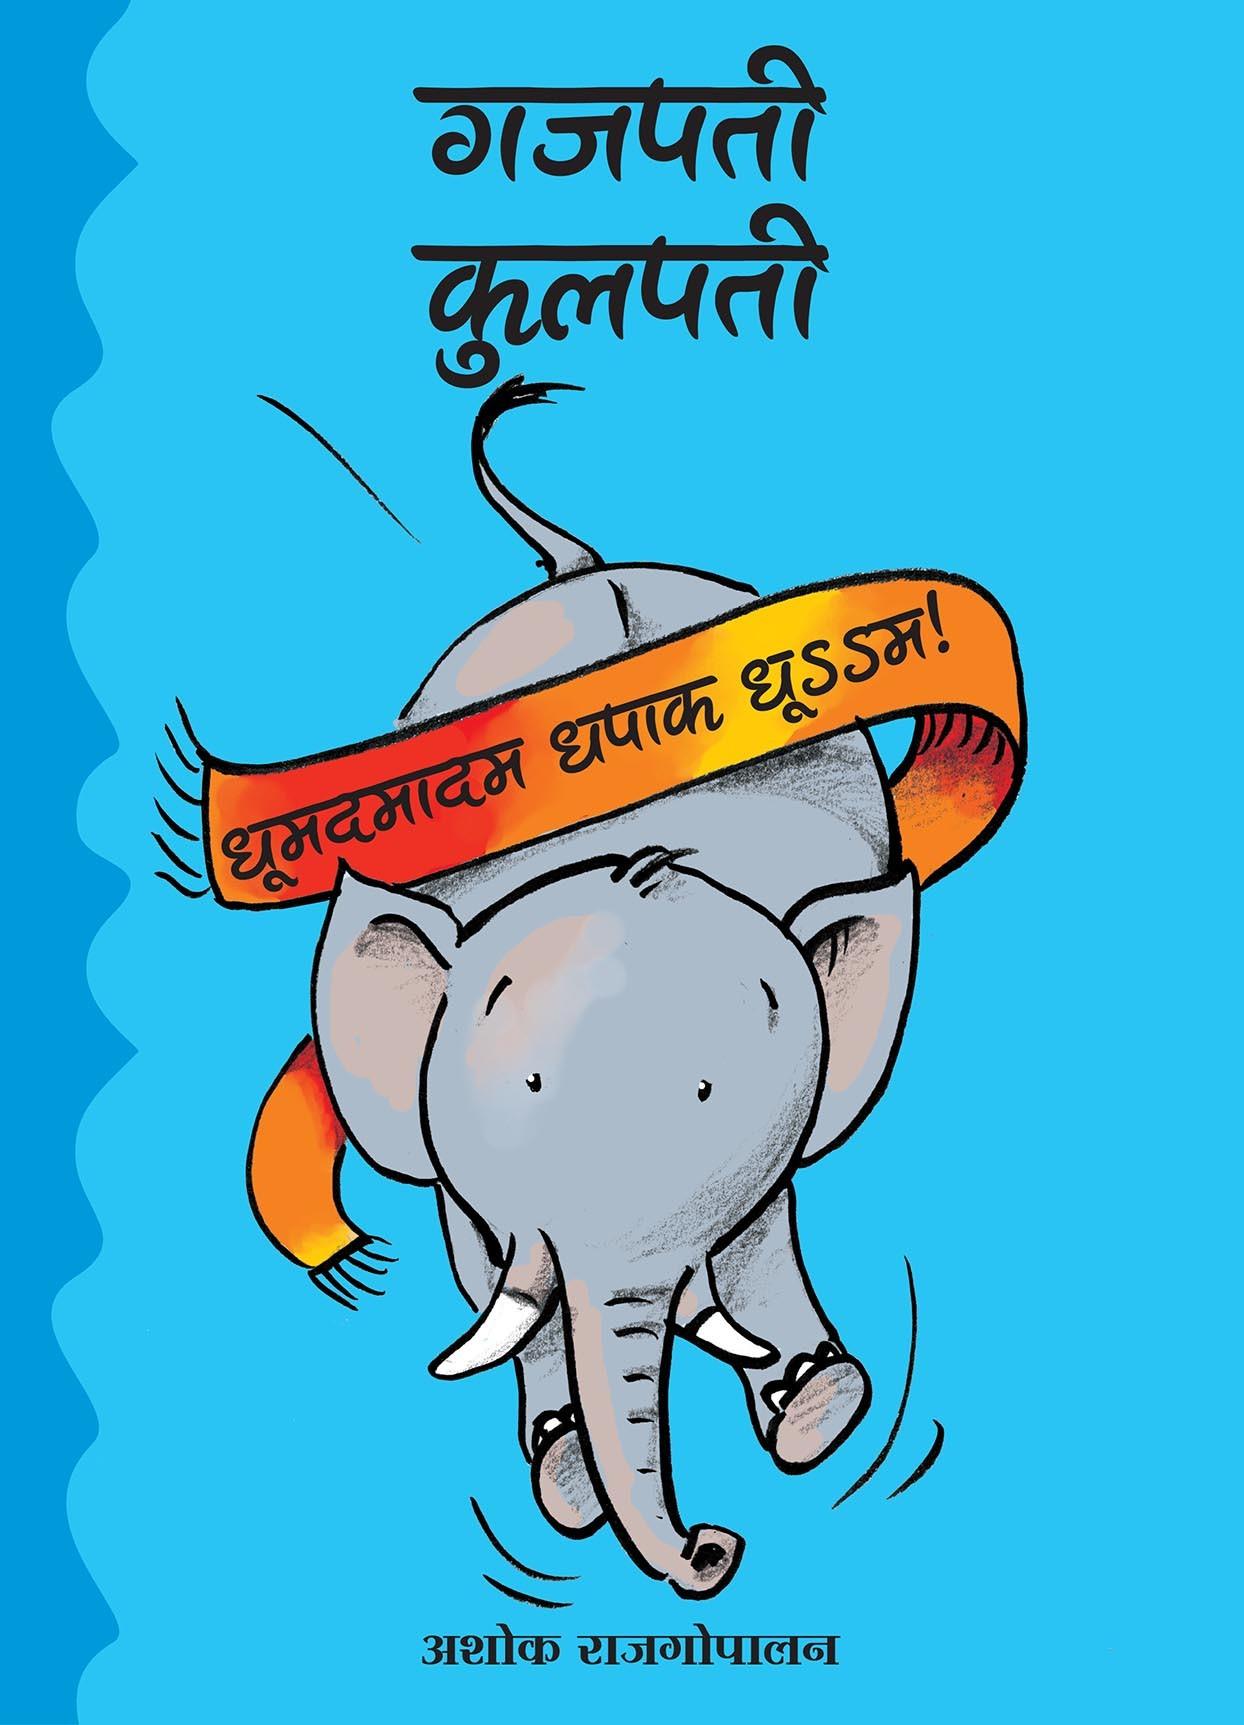 Gajapati Kulapati Kalabalooosh/Gajapati Kulapati-Dhoomdamadam Dhapaak Dhoom! (Marathi)